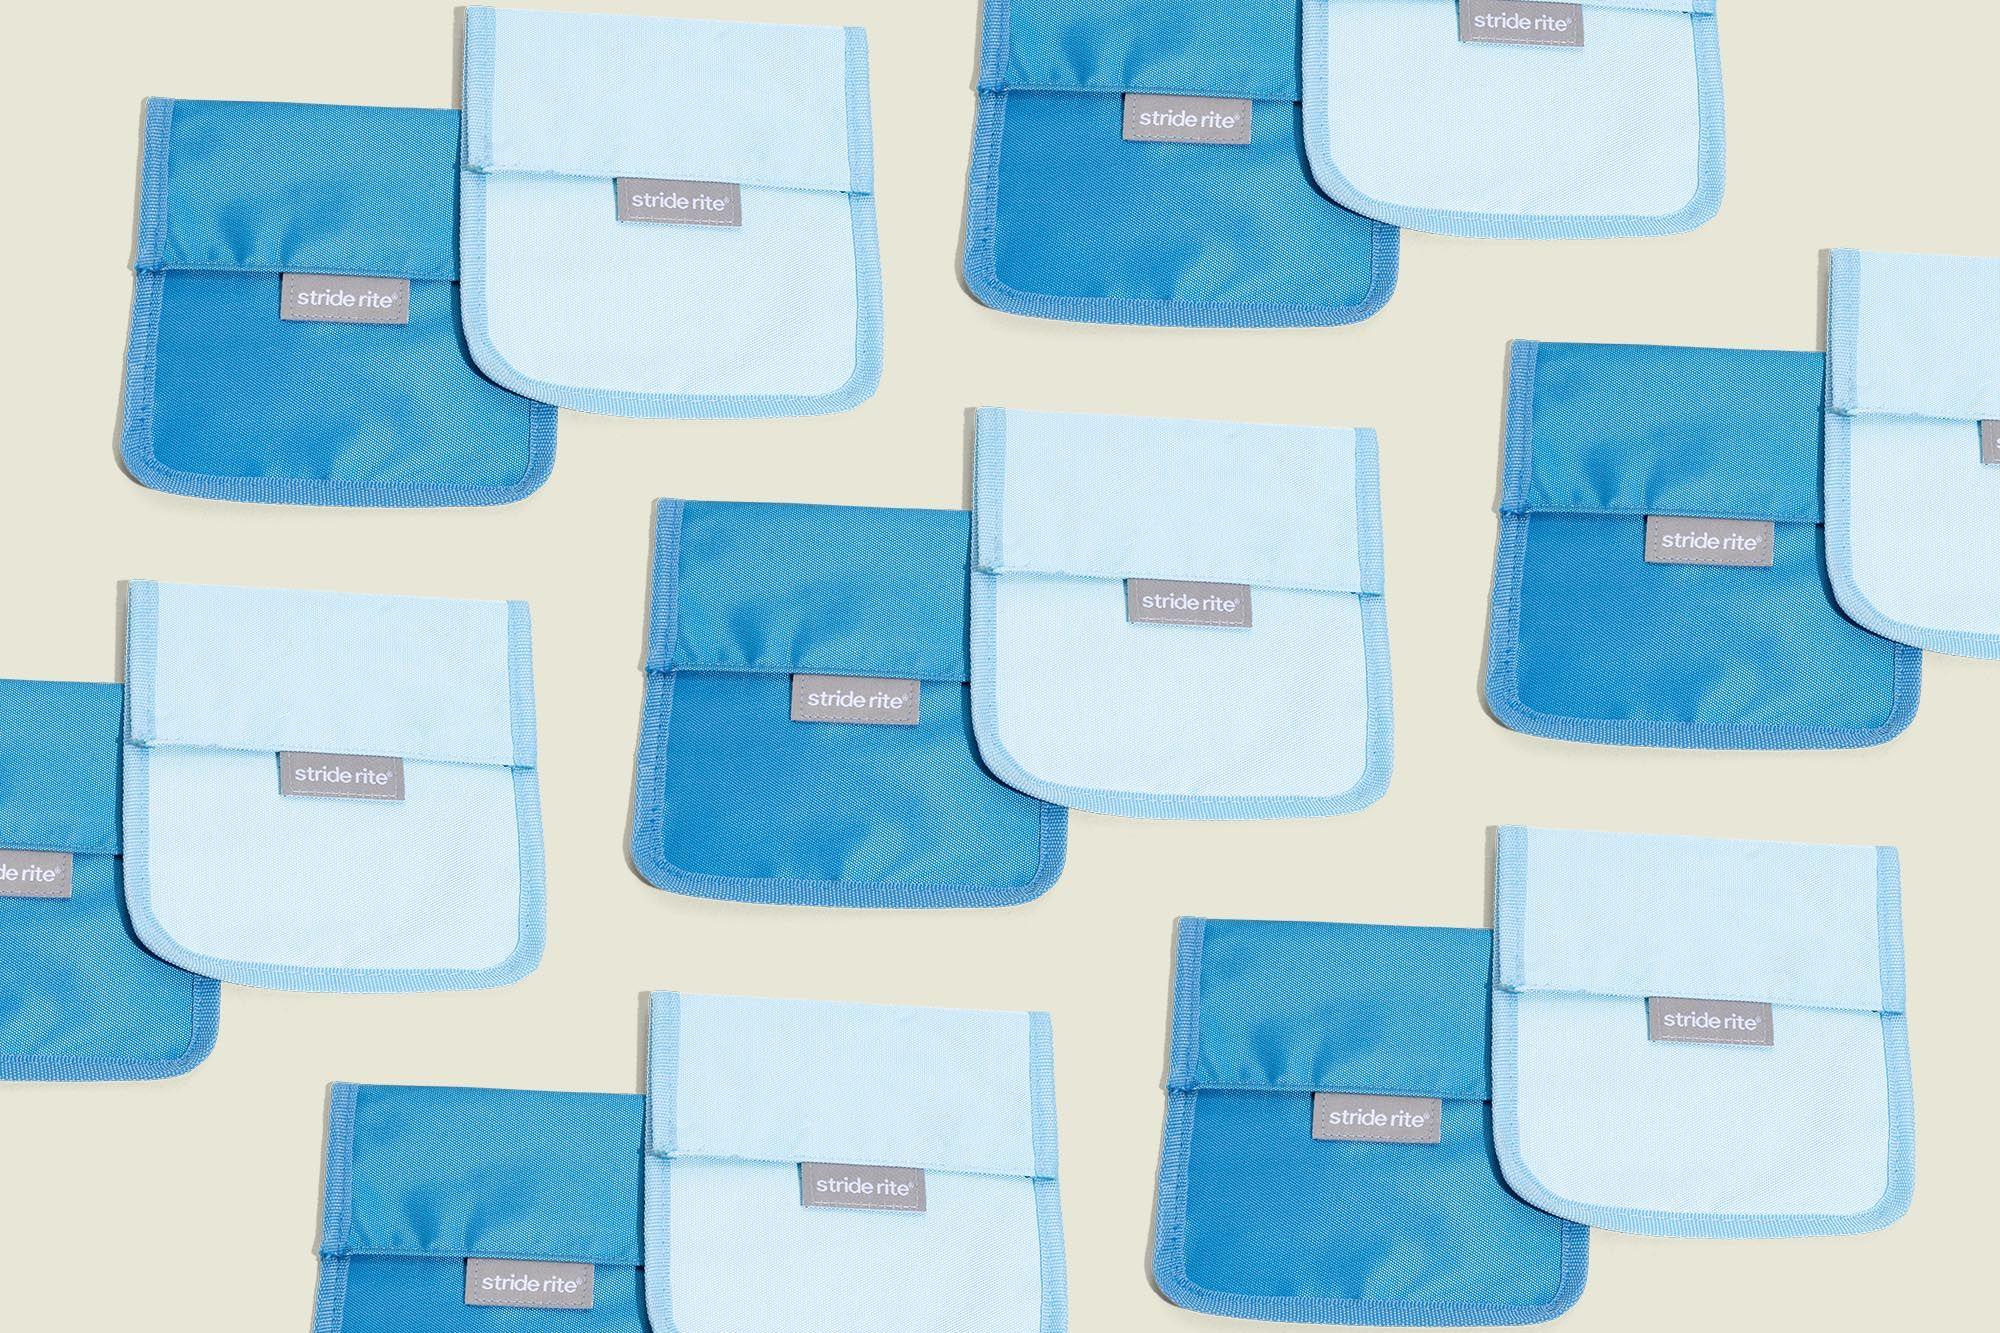 Blue flat pouches